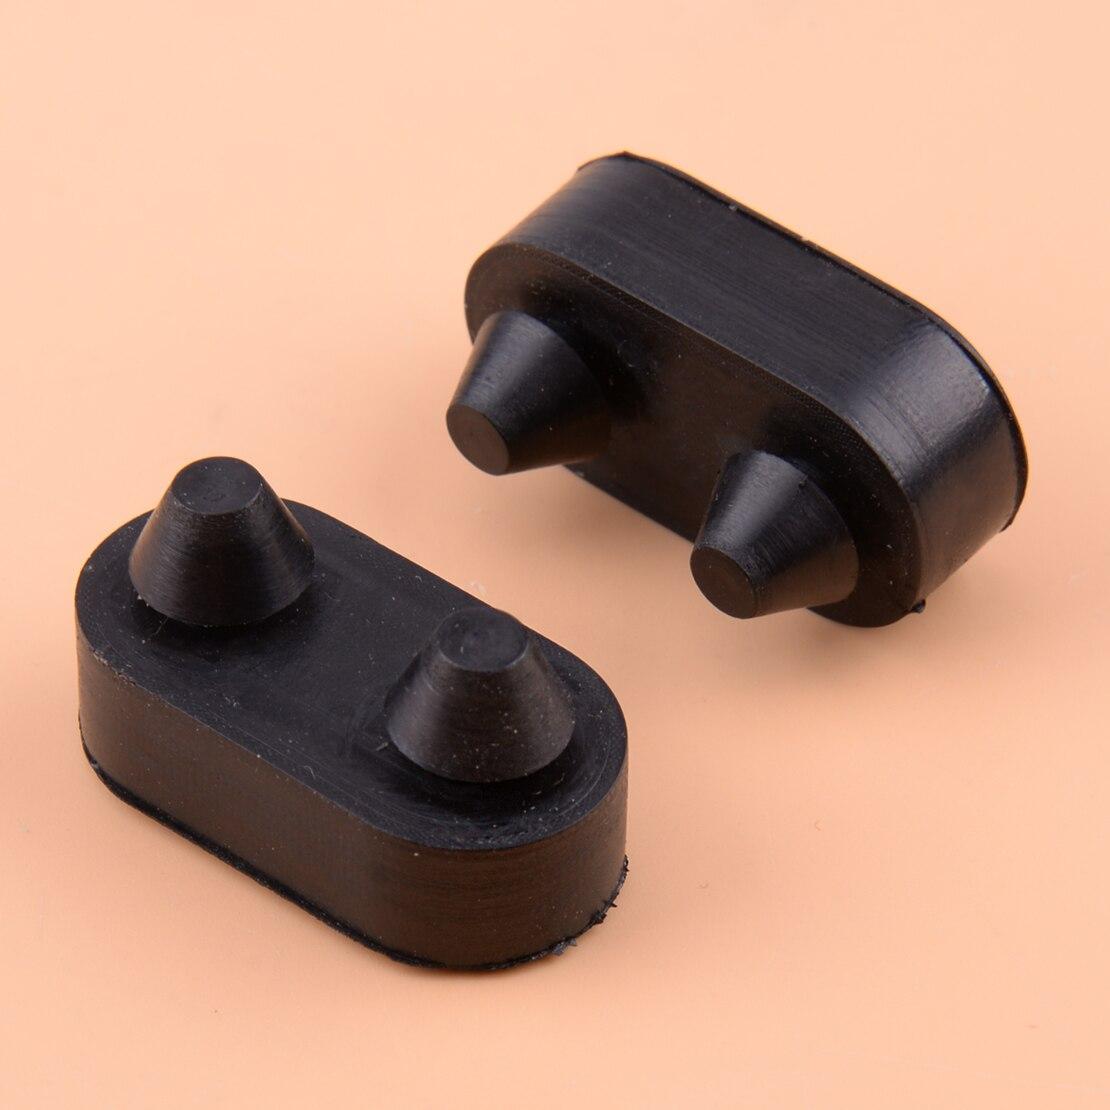 CITALL caucho negro 2 uds Hood cerradura cerraduras corchetes de captura apto para Jeep Wrangler TJ 1997-2003, 2004, 2005, 2006